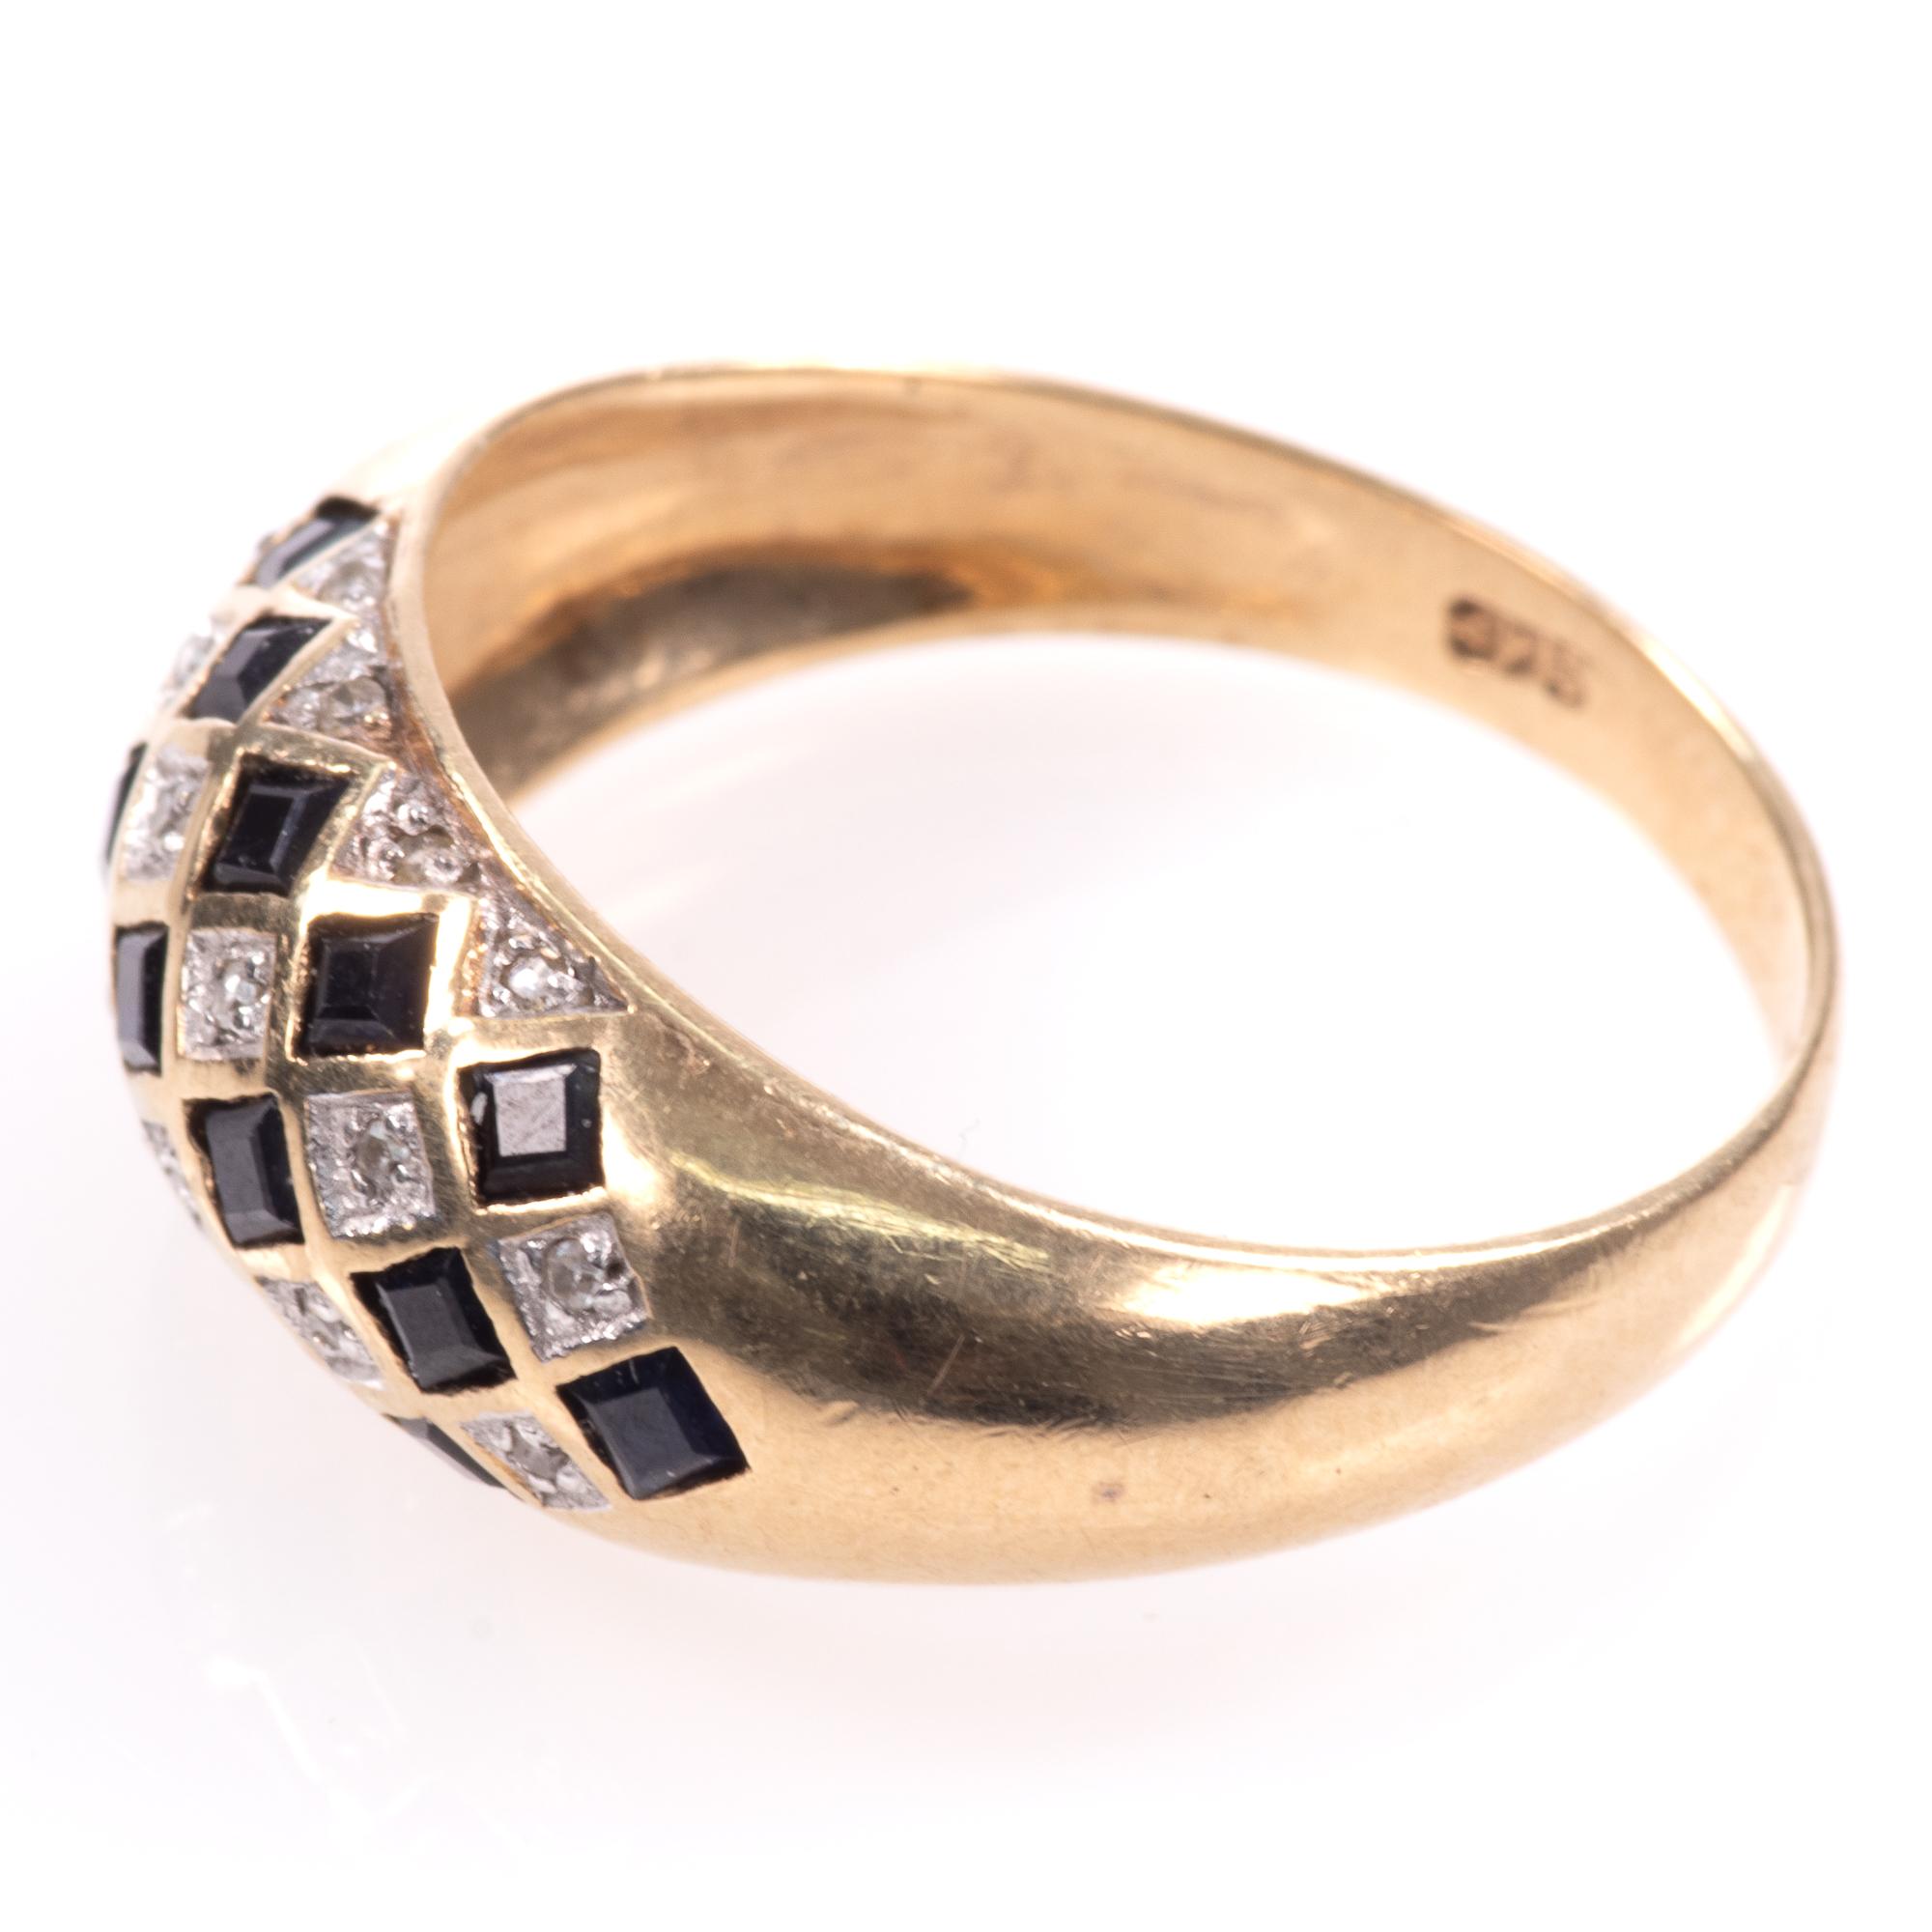 9ct Gold Art Deco Style 0.68ct Sapphire & Diamond Ring - Image 5 of 8